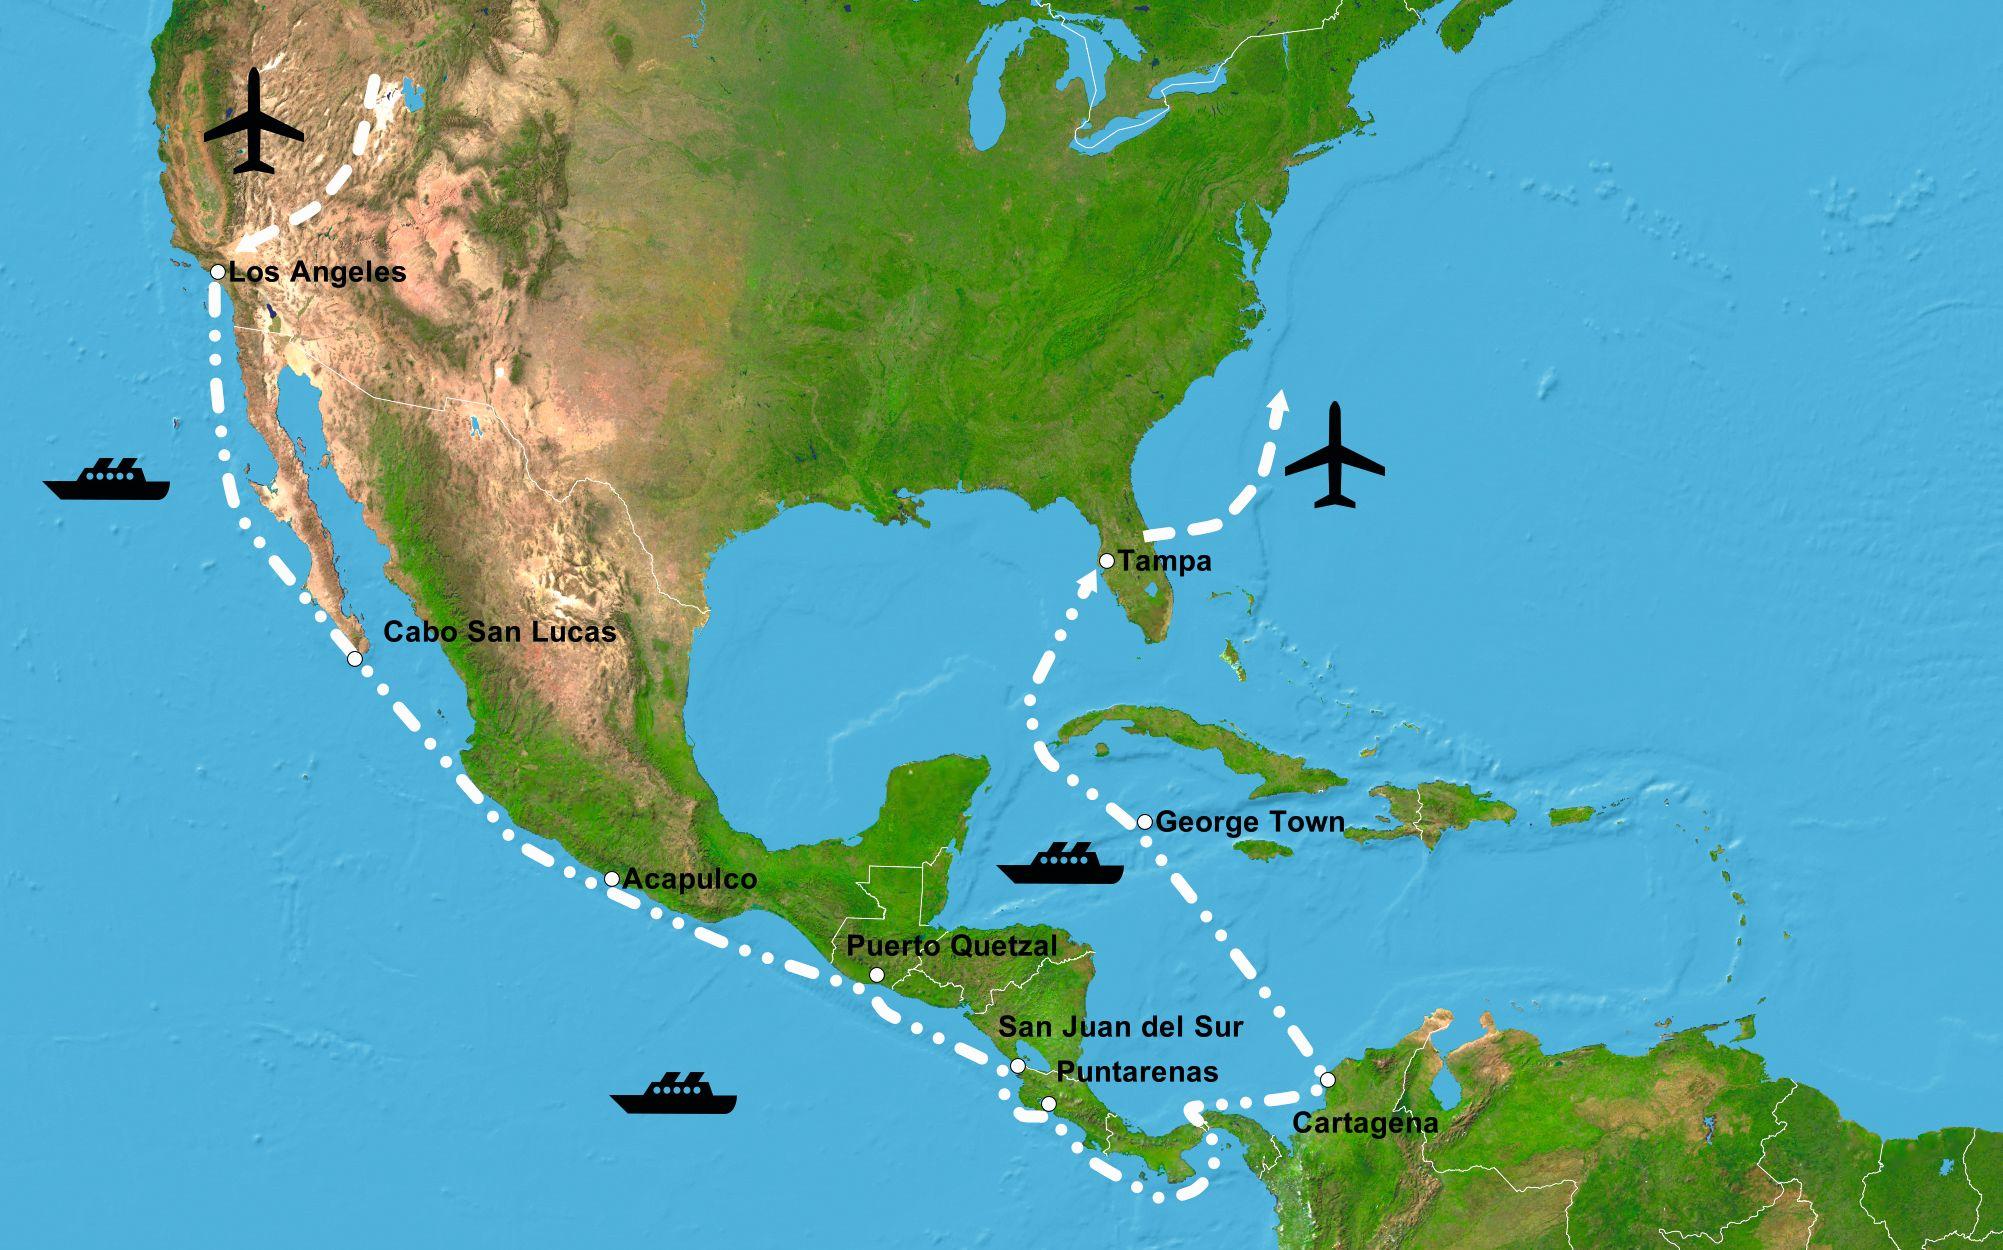 panamakanal karte Karte Panamakanal 2018 neu   VRM Reisen